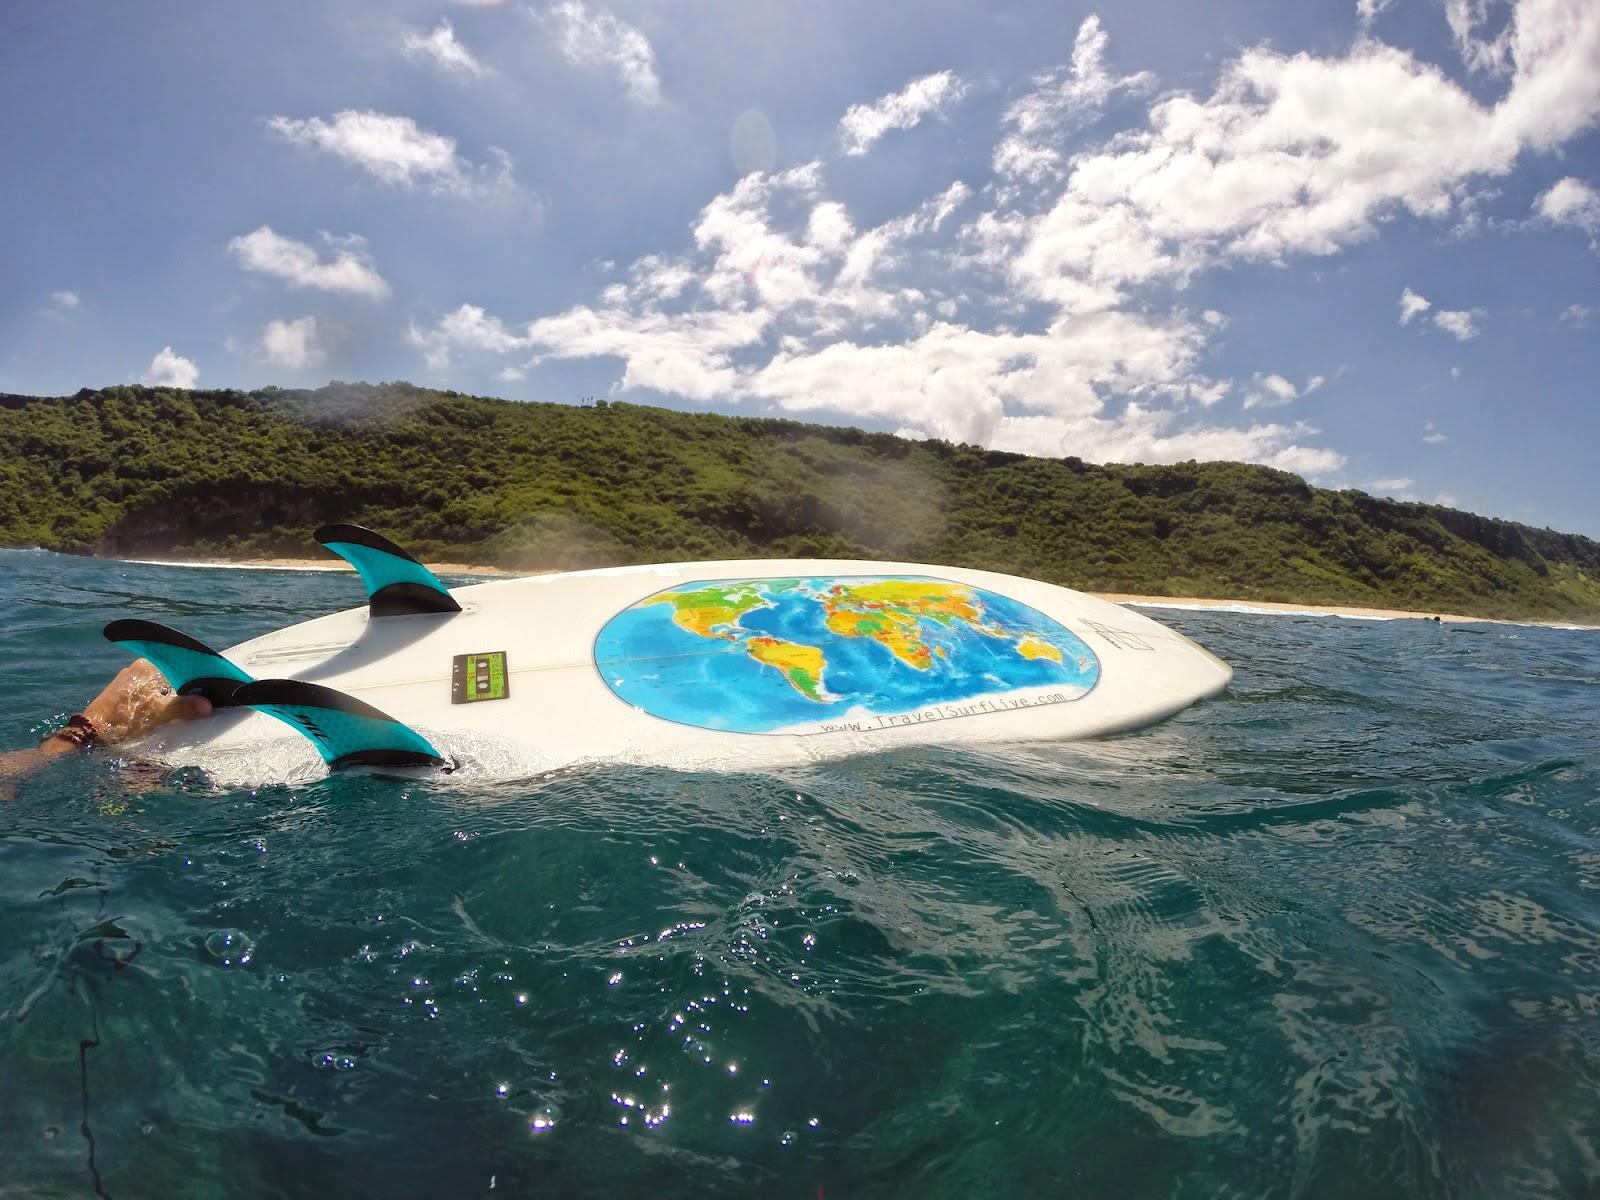 bali bukit trifekta surfboard